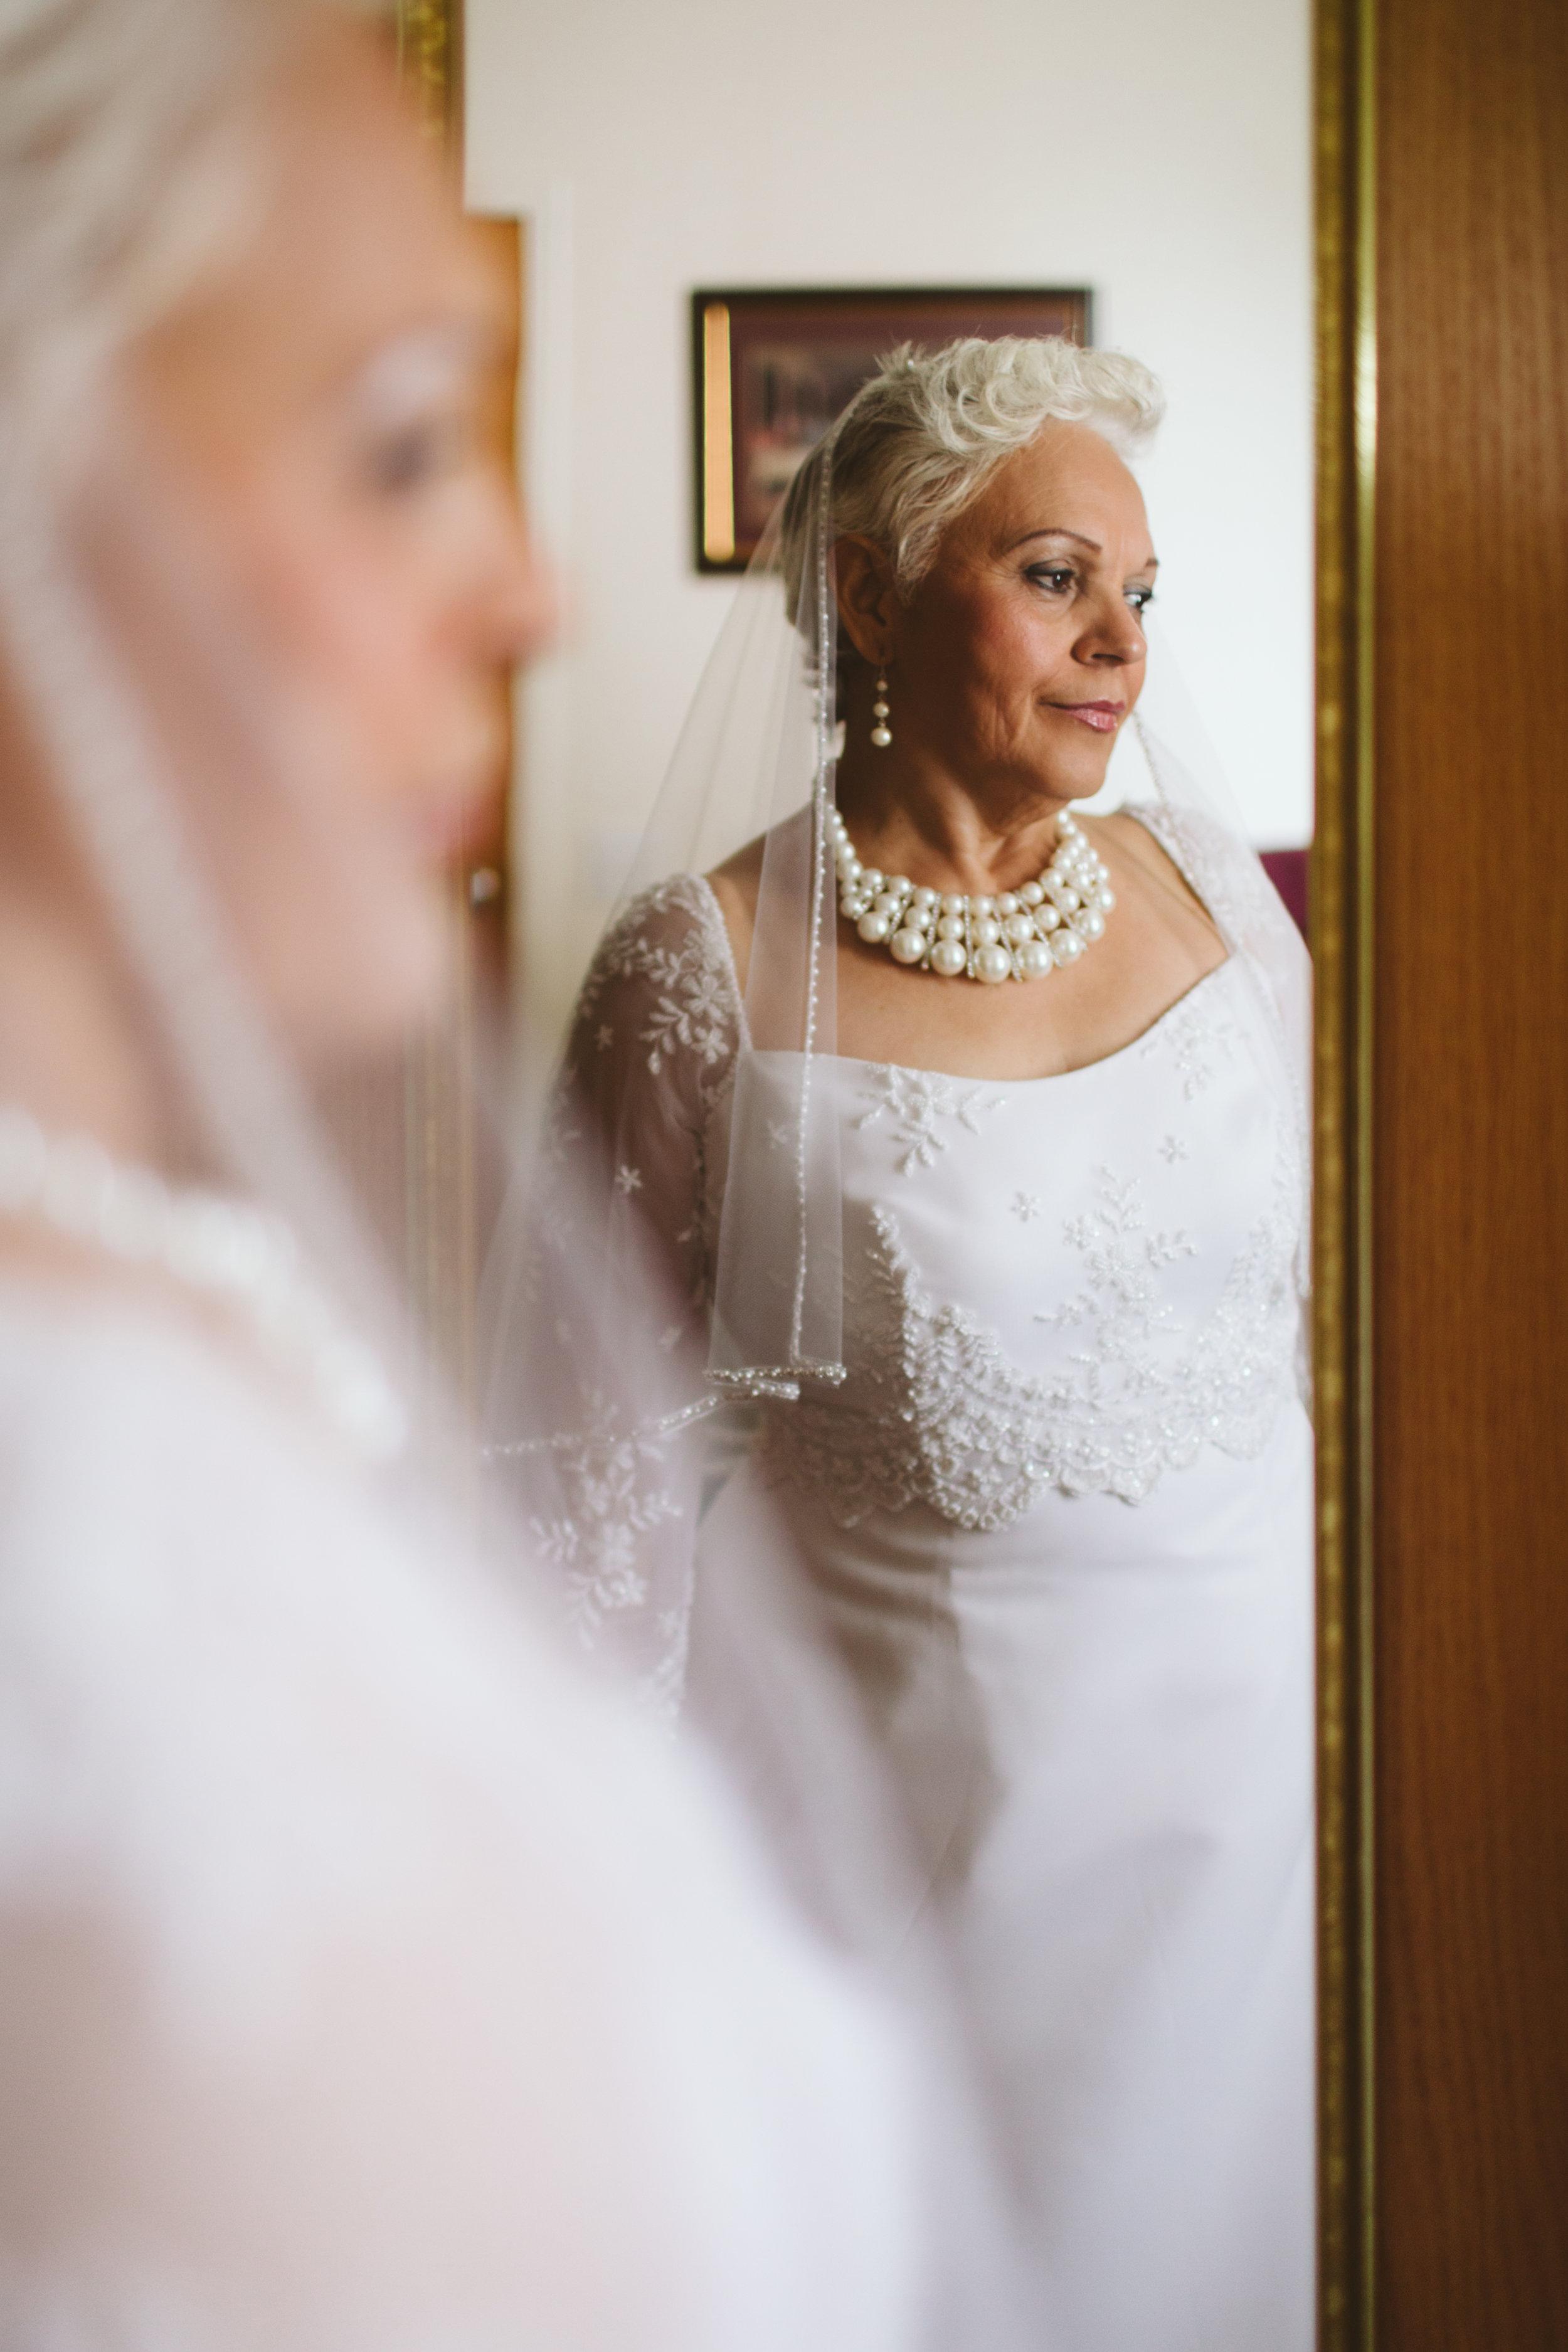 wedding | Vanessa Boy Photography | vanessaboy.com |-26.jpg